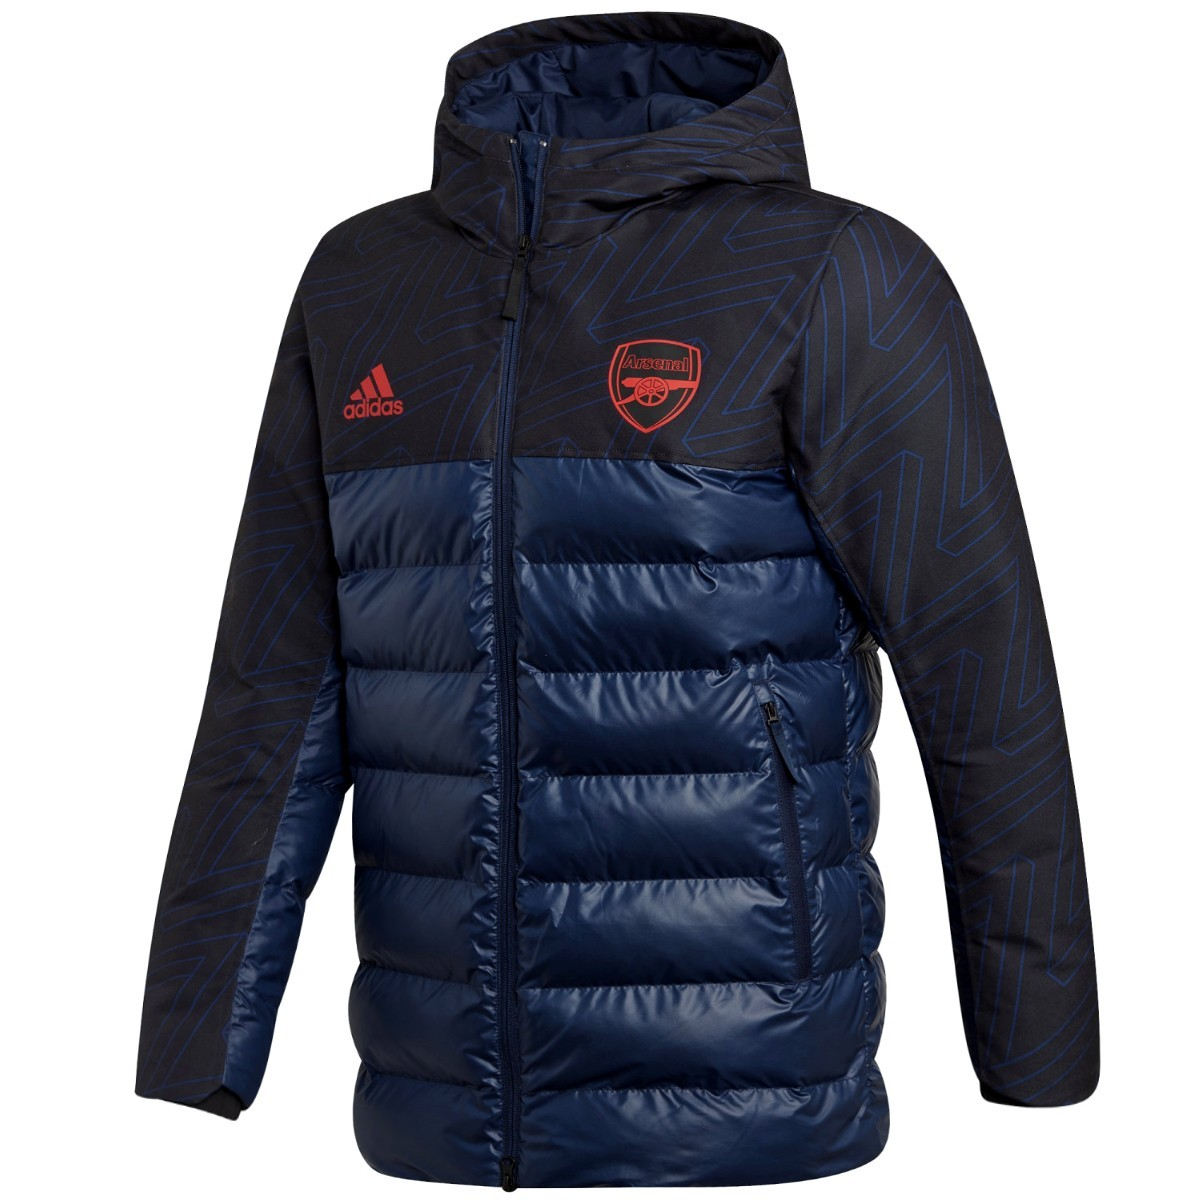 Matar importante Memorizar  Arsenal FC presentation down padded jacket 2019/20 - Adidas -  SportingPlus.net